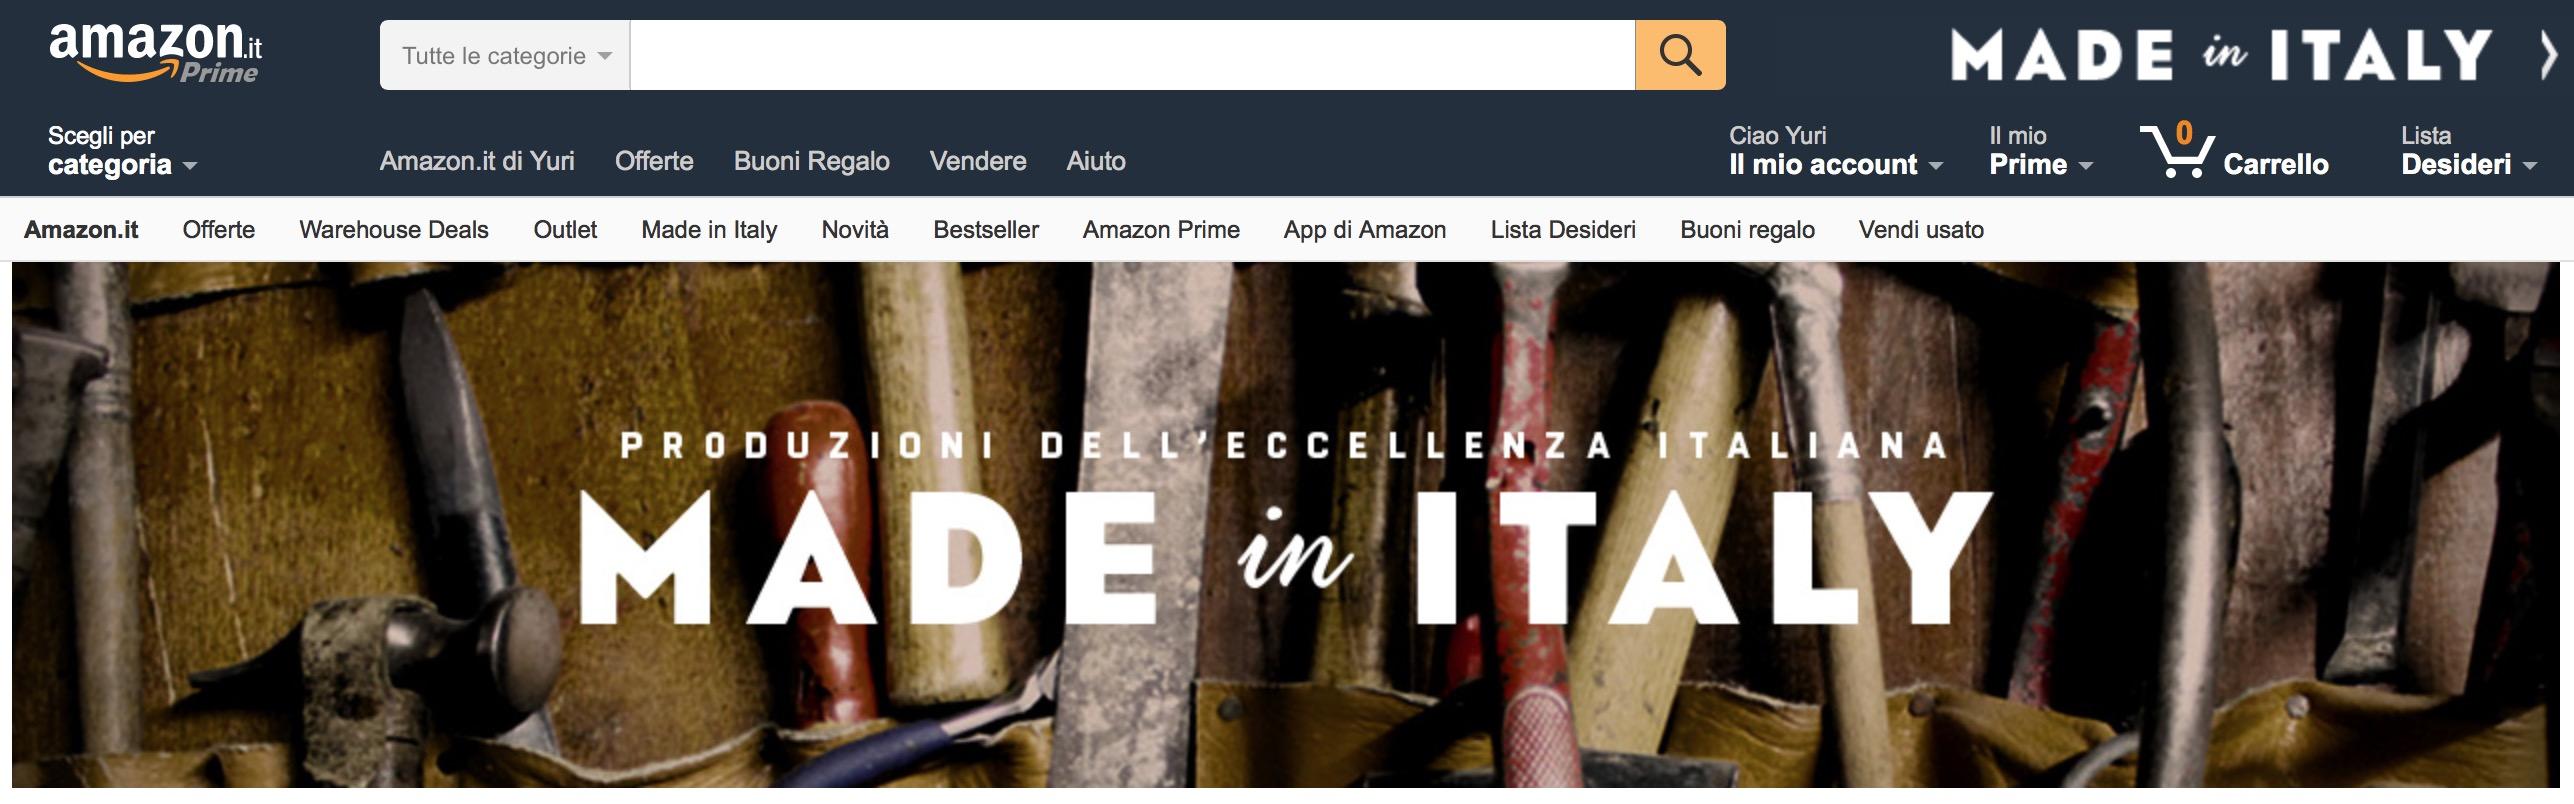 Amazon made in italy ora botteghe e artigiani italiani for Artigianato italia